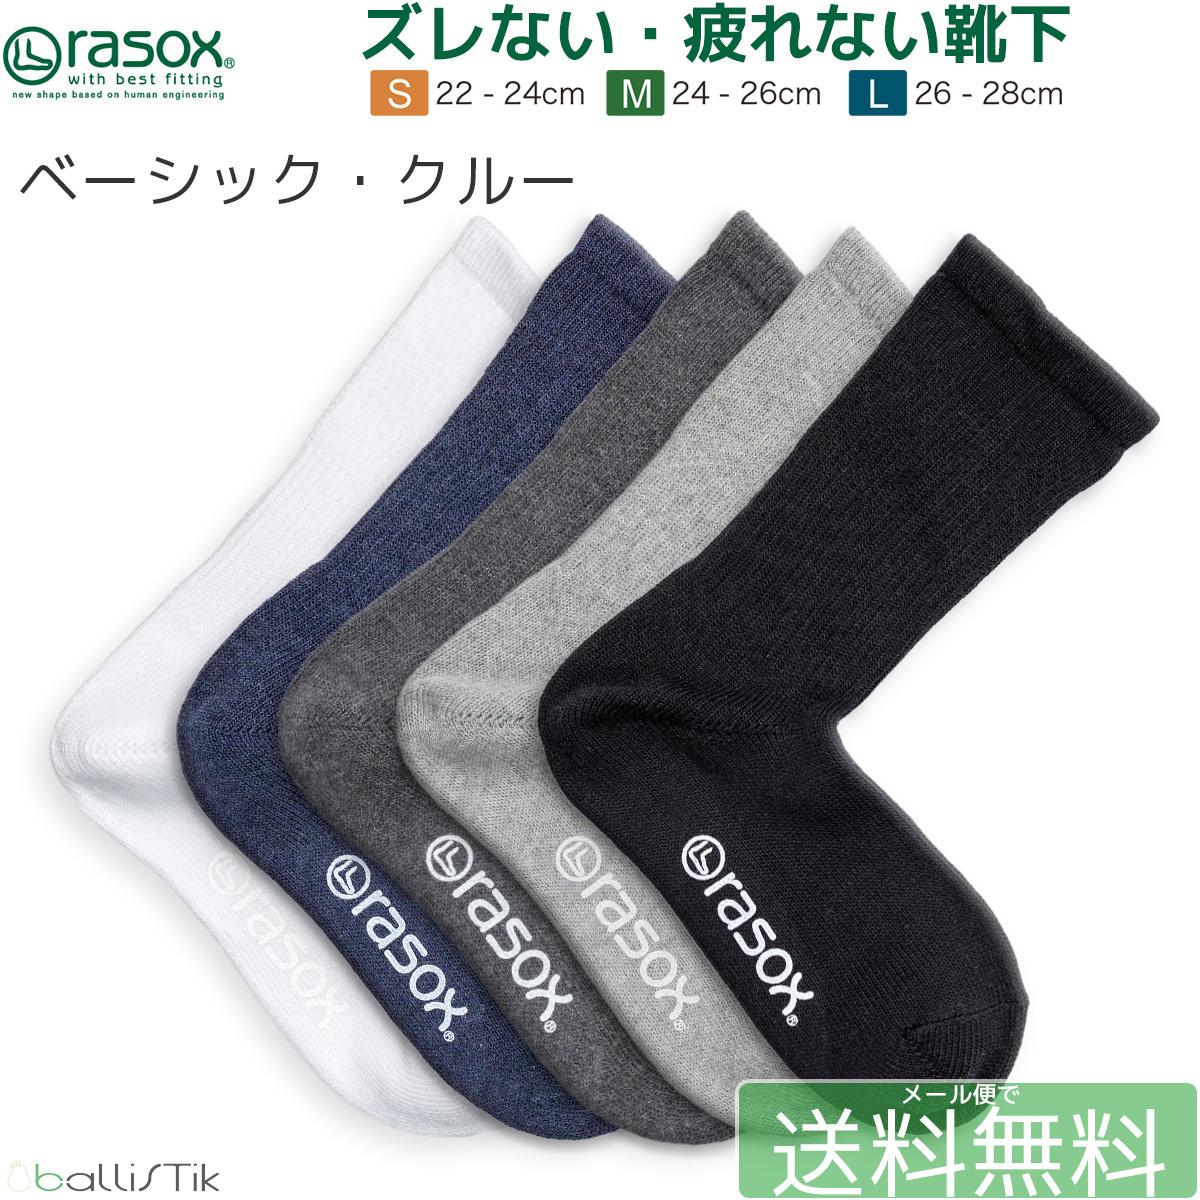 rasox/ラソックス/靴下/クルーソックス/ベーシック/メイン